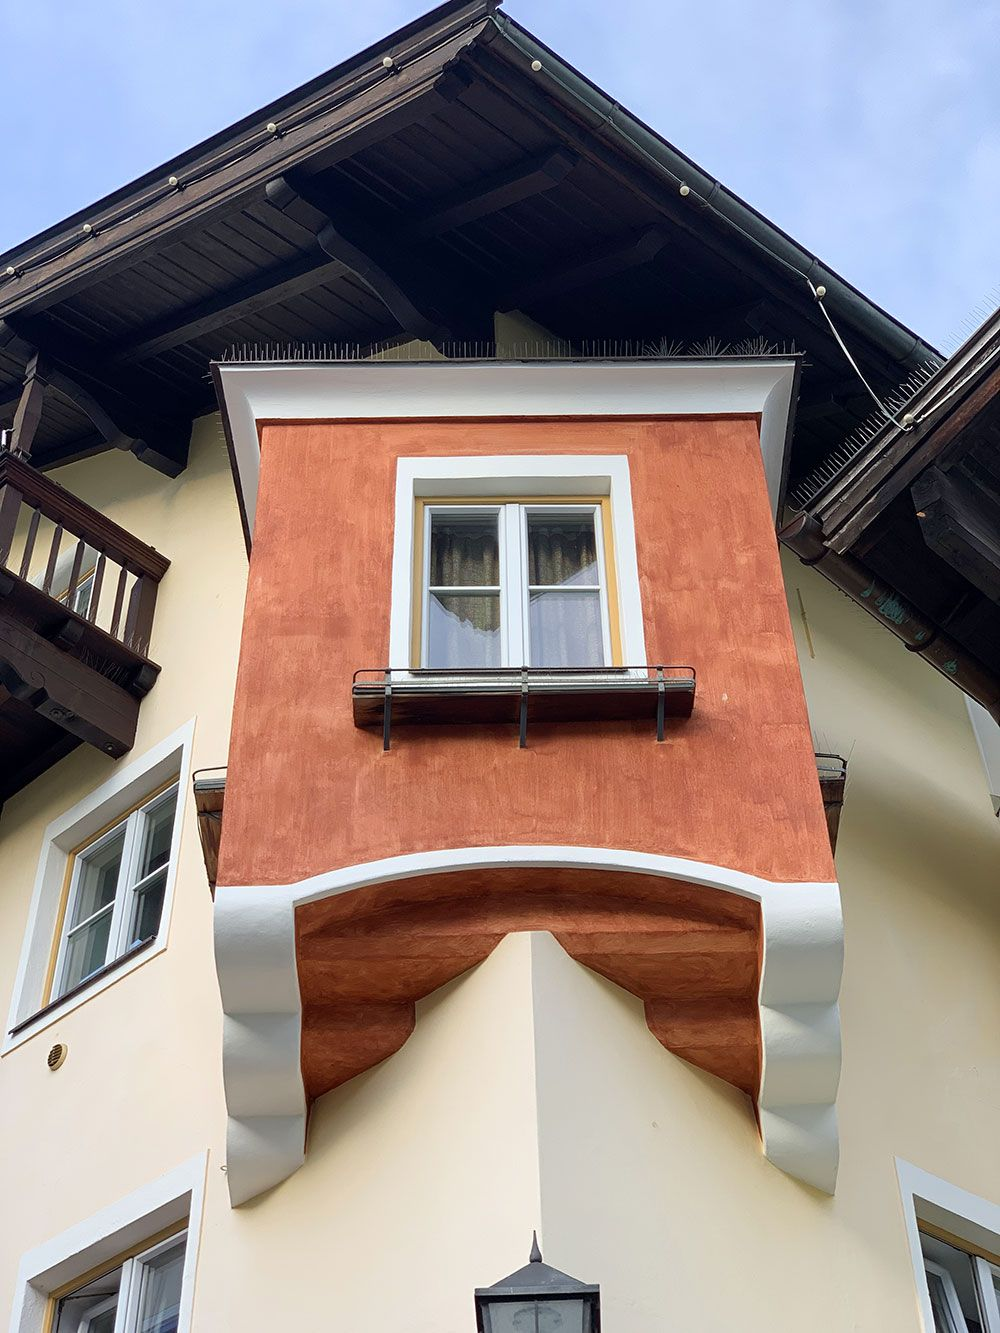 Ventana saliente en Kitzbühel